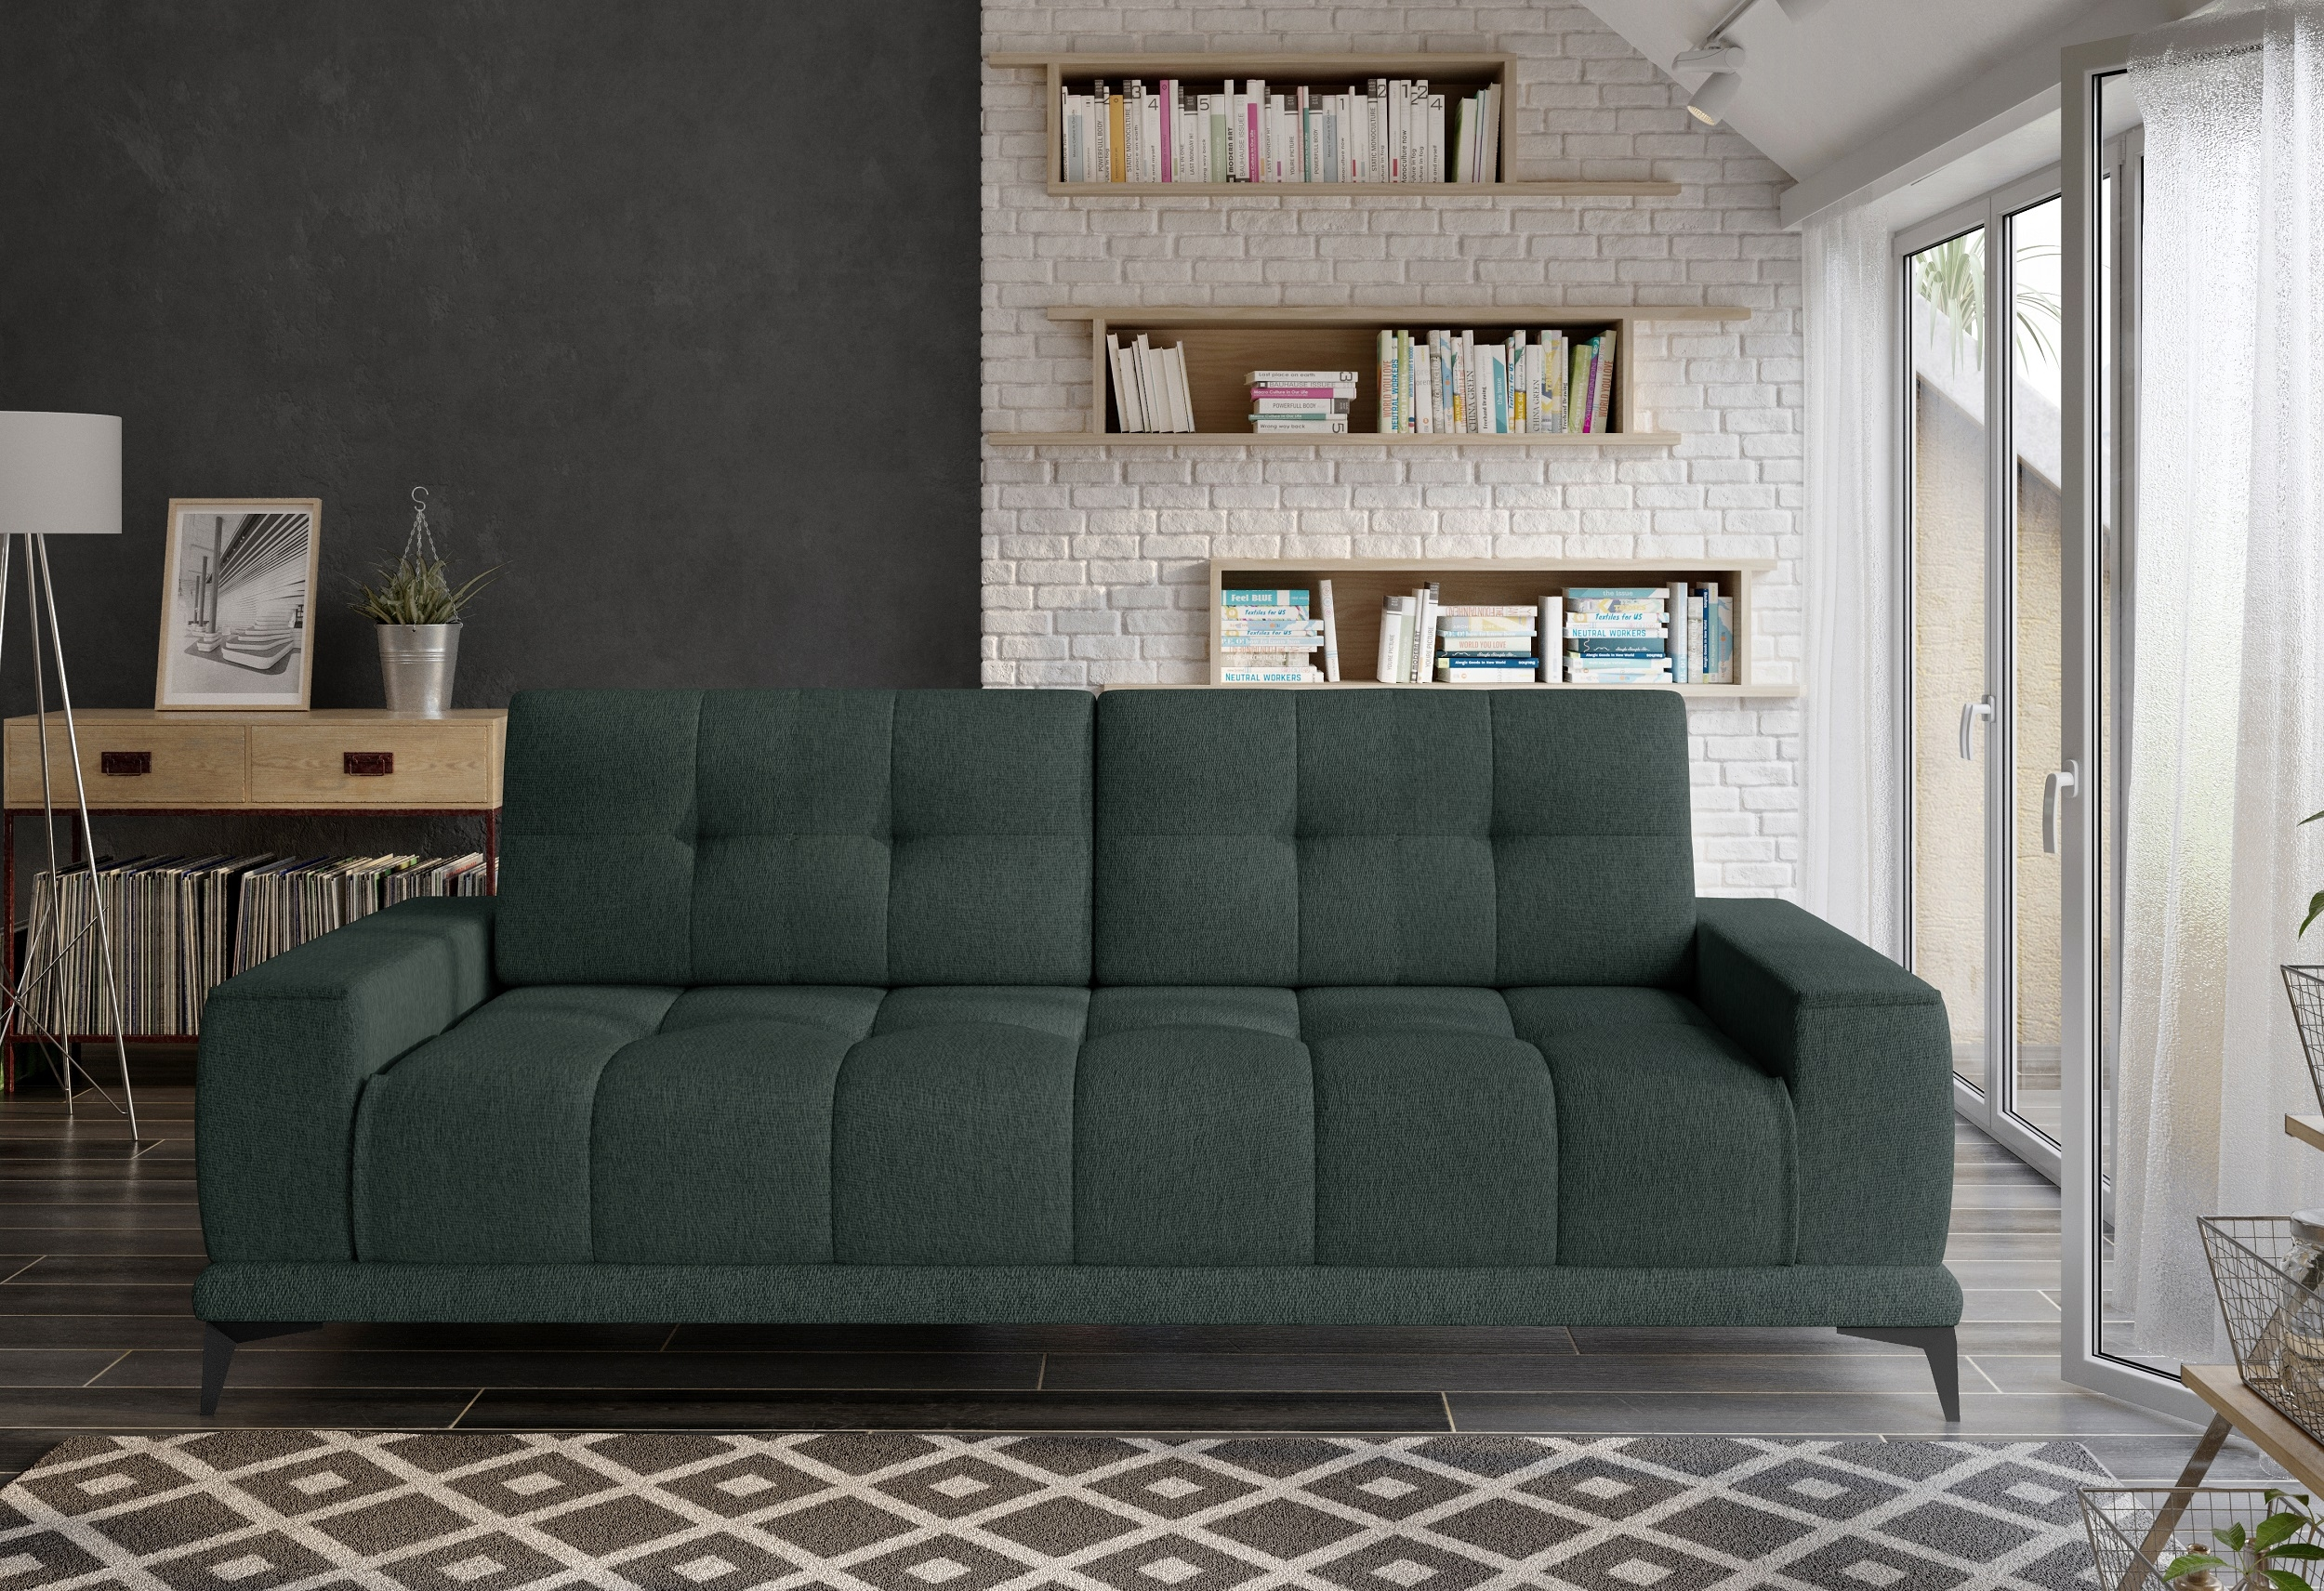 Canapea extensibila cu lada de depozitare, tapitata cu stofa 3 locuri Mamba Verde inchis, l248xA104xH91 cm